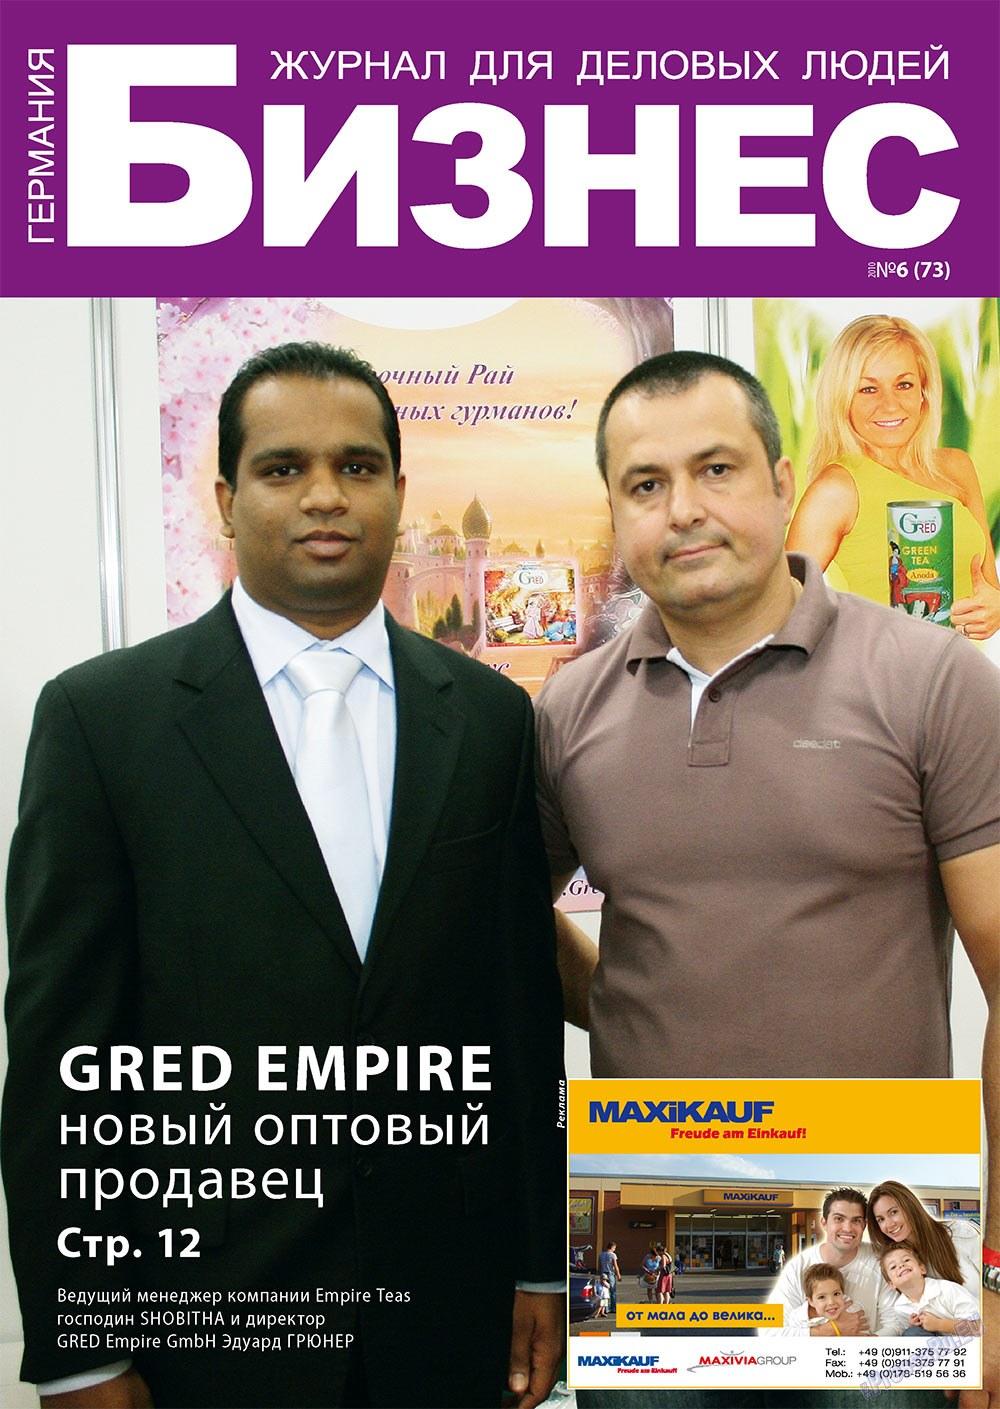 Бизнес (журнал). 2010 год, номер 6, стр. 1